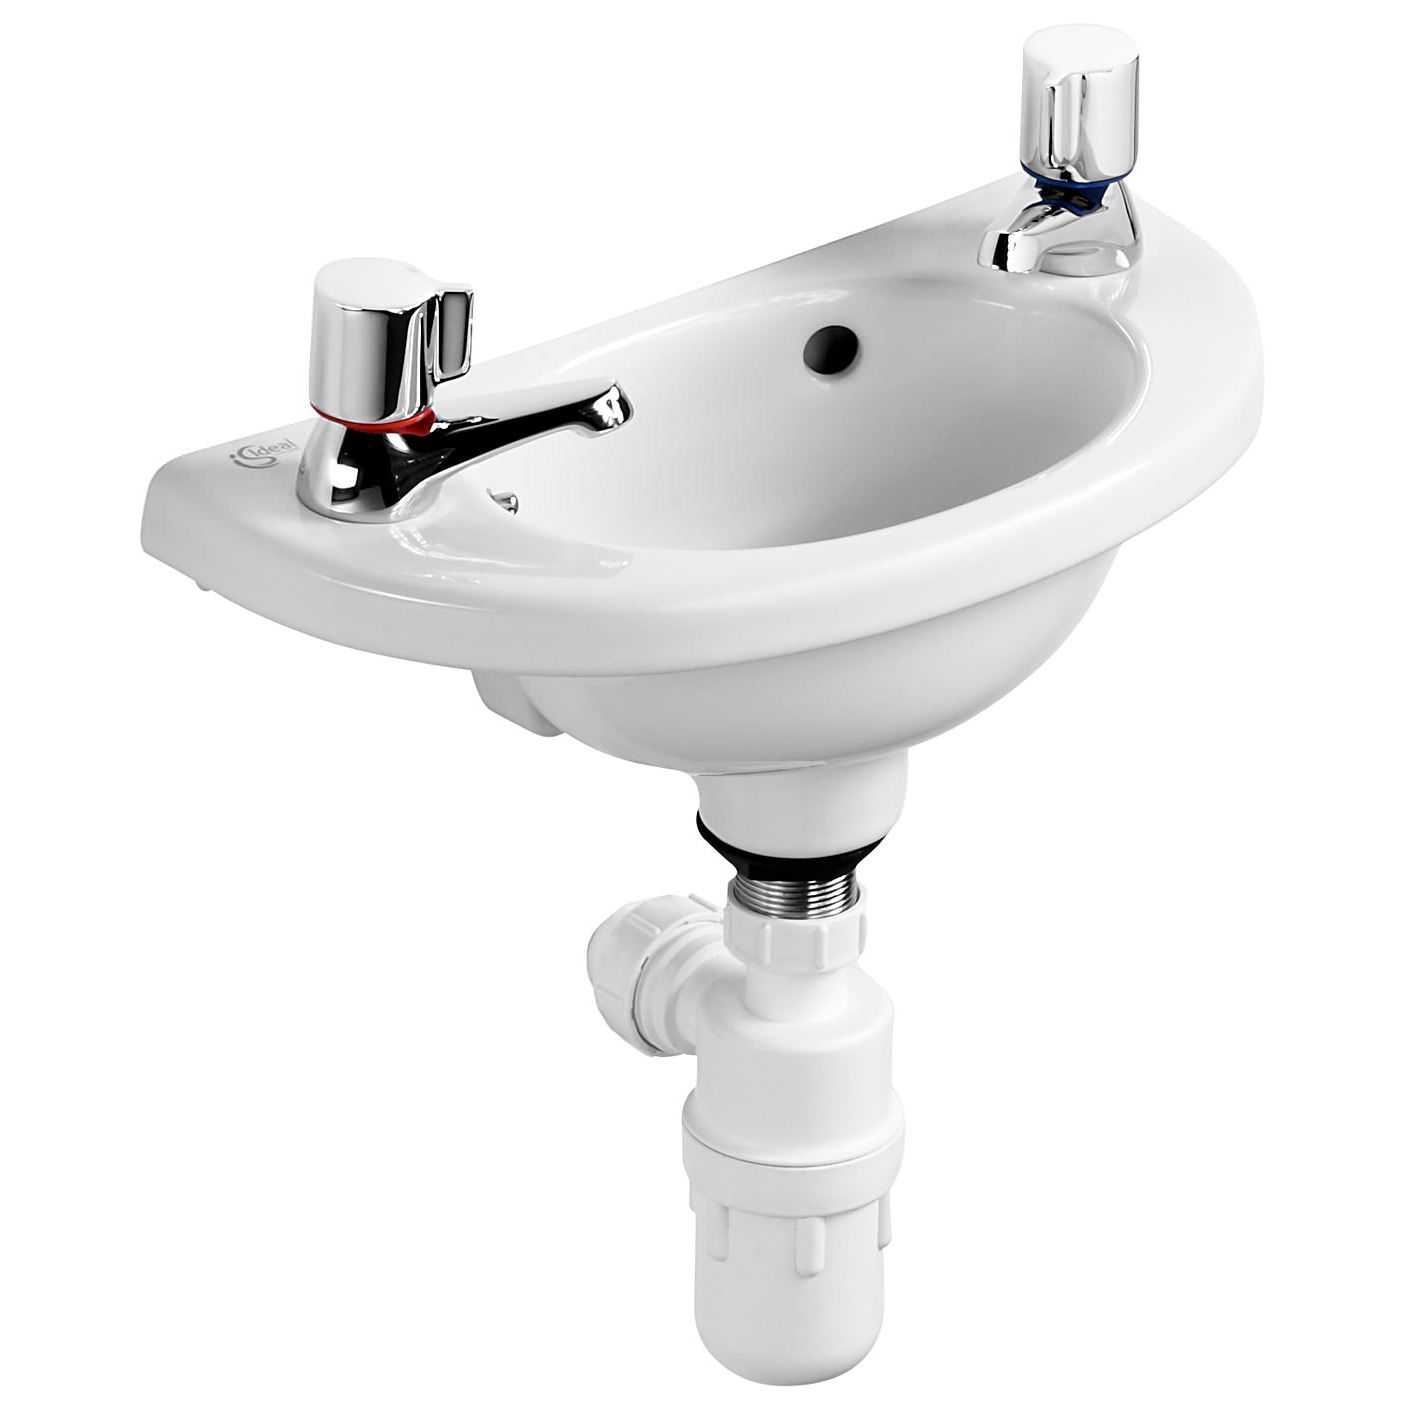 Ideal Standard Space Micro Wash Basin 400mm E617501